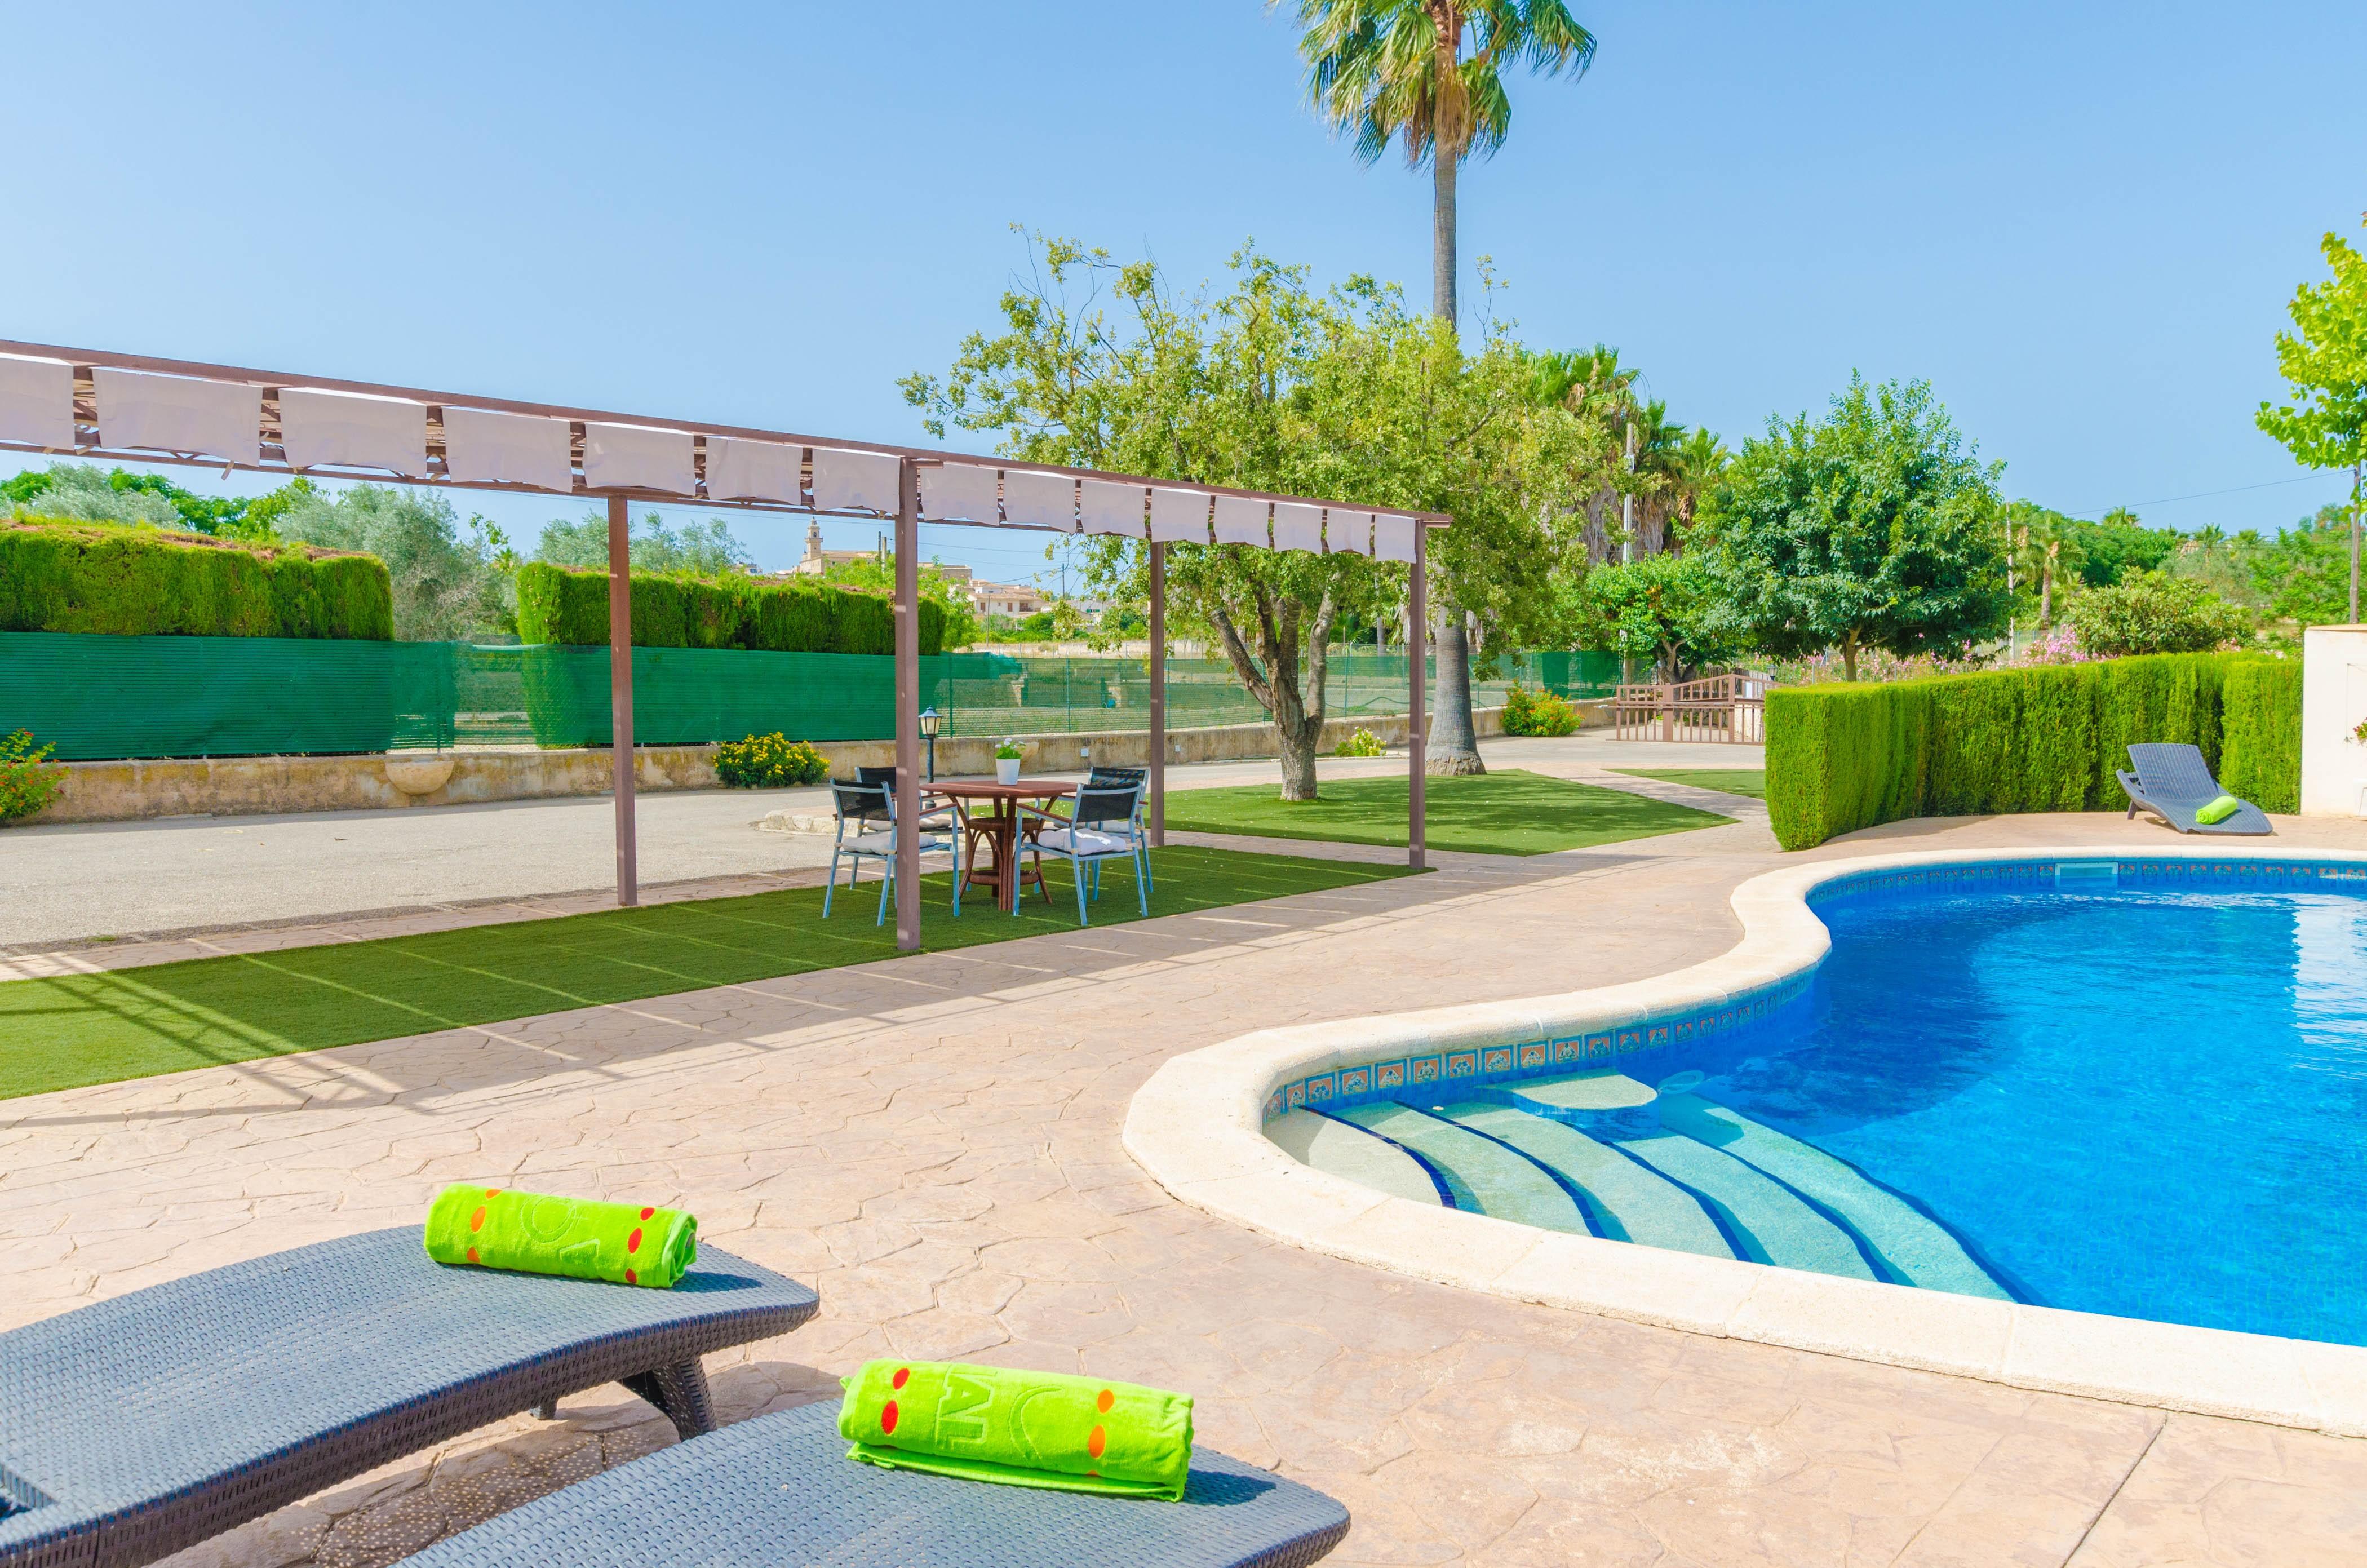 Maison de vacances SA SINIA (2374876), Lloret de Vistalegre, Majorque, Iles Baléares, Espagne, image 45